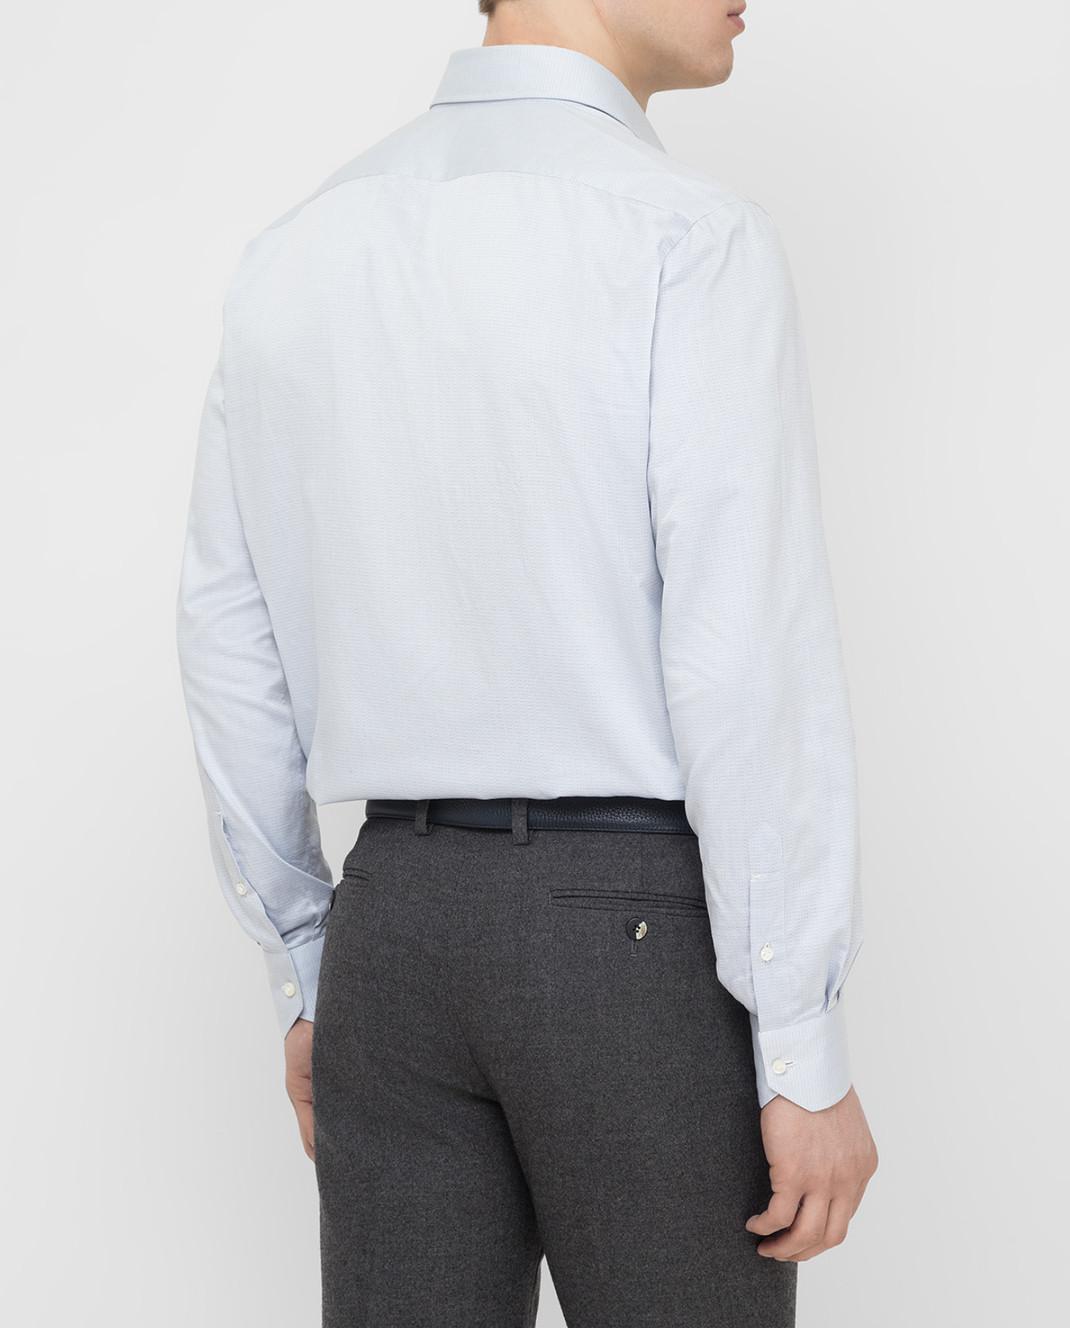 Luciano Lombardi Голубая рубашка 66216210 изображение 4